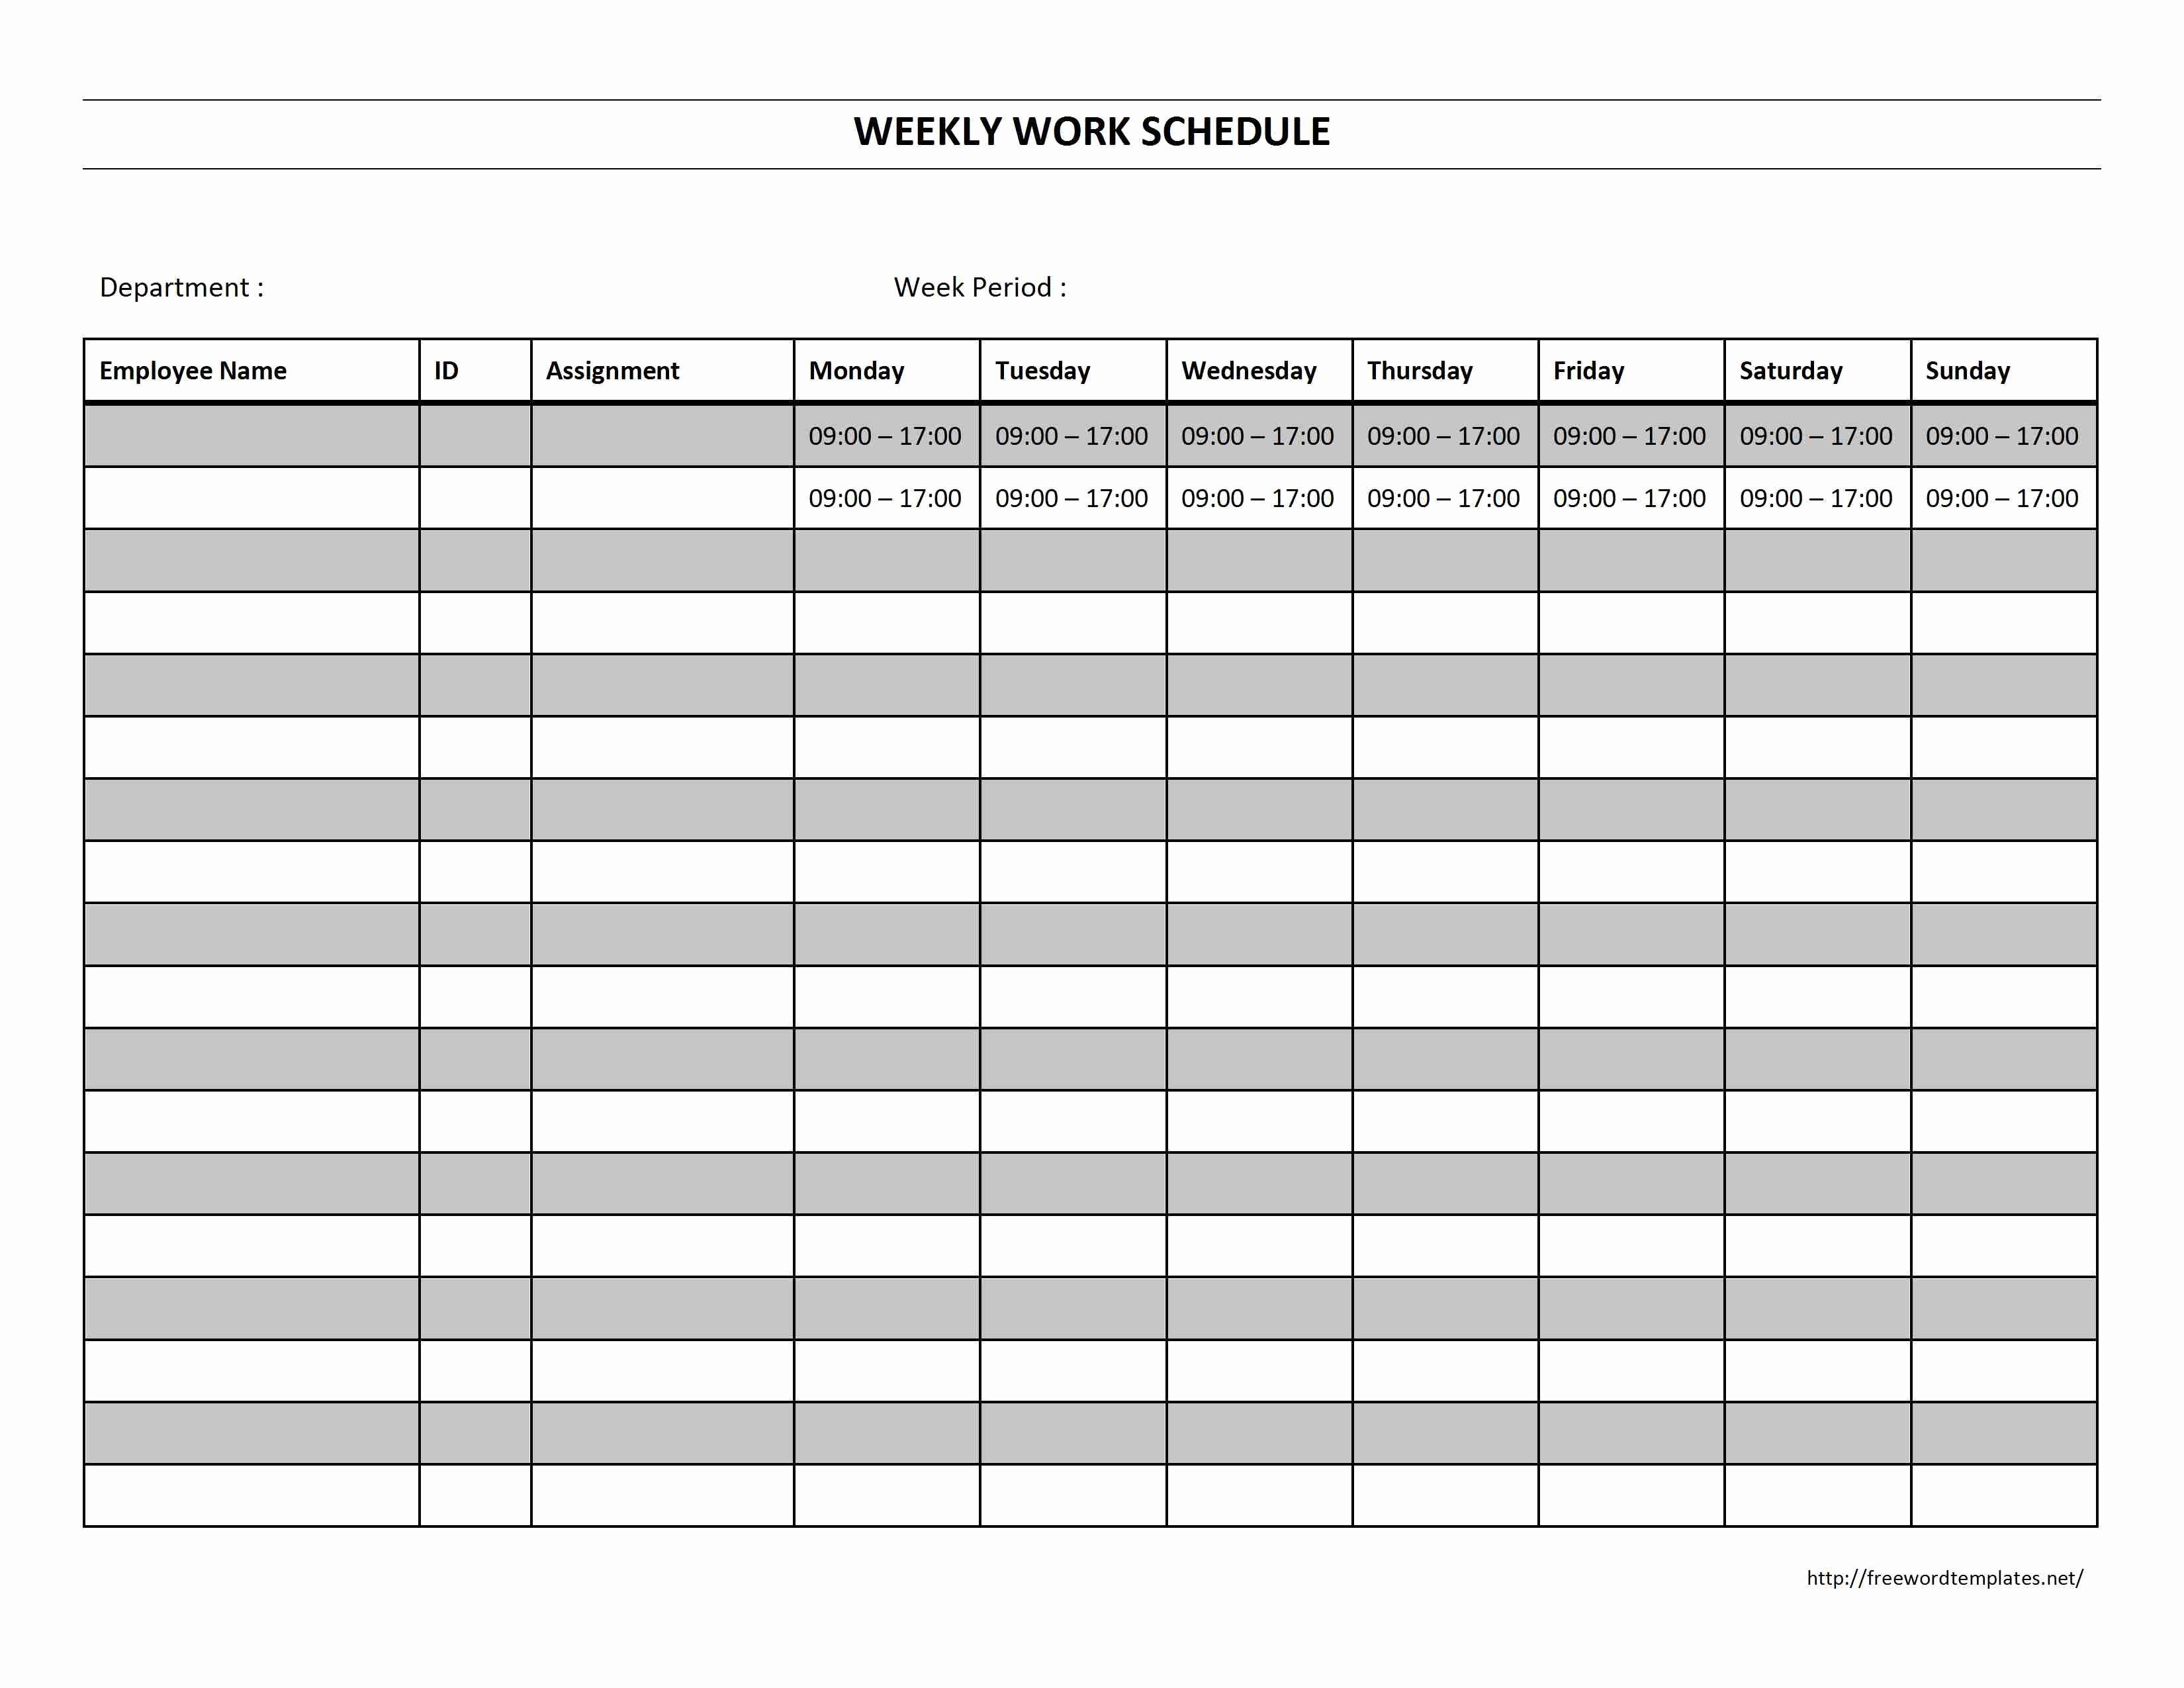 Weekly Work Schedule Template Free Lovely Weekly Work Schedule